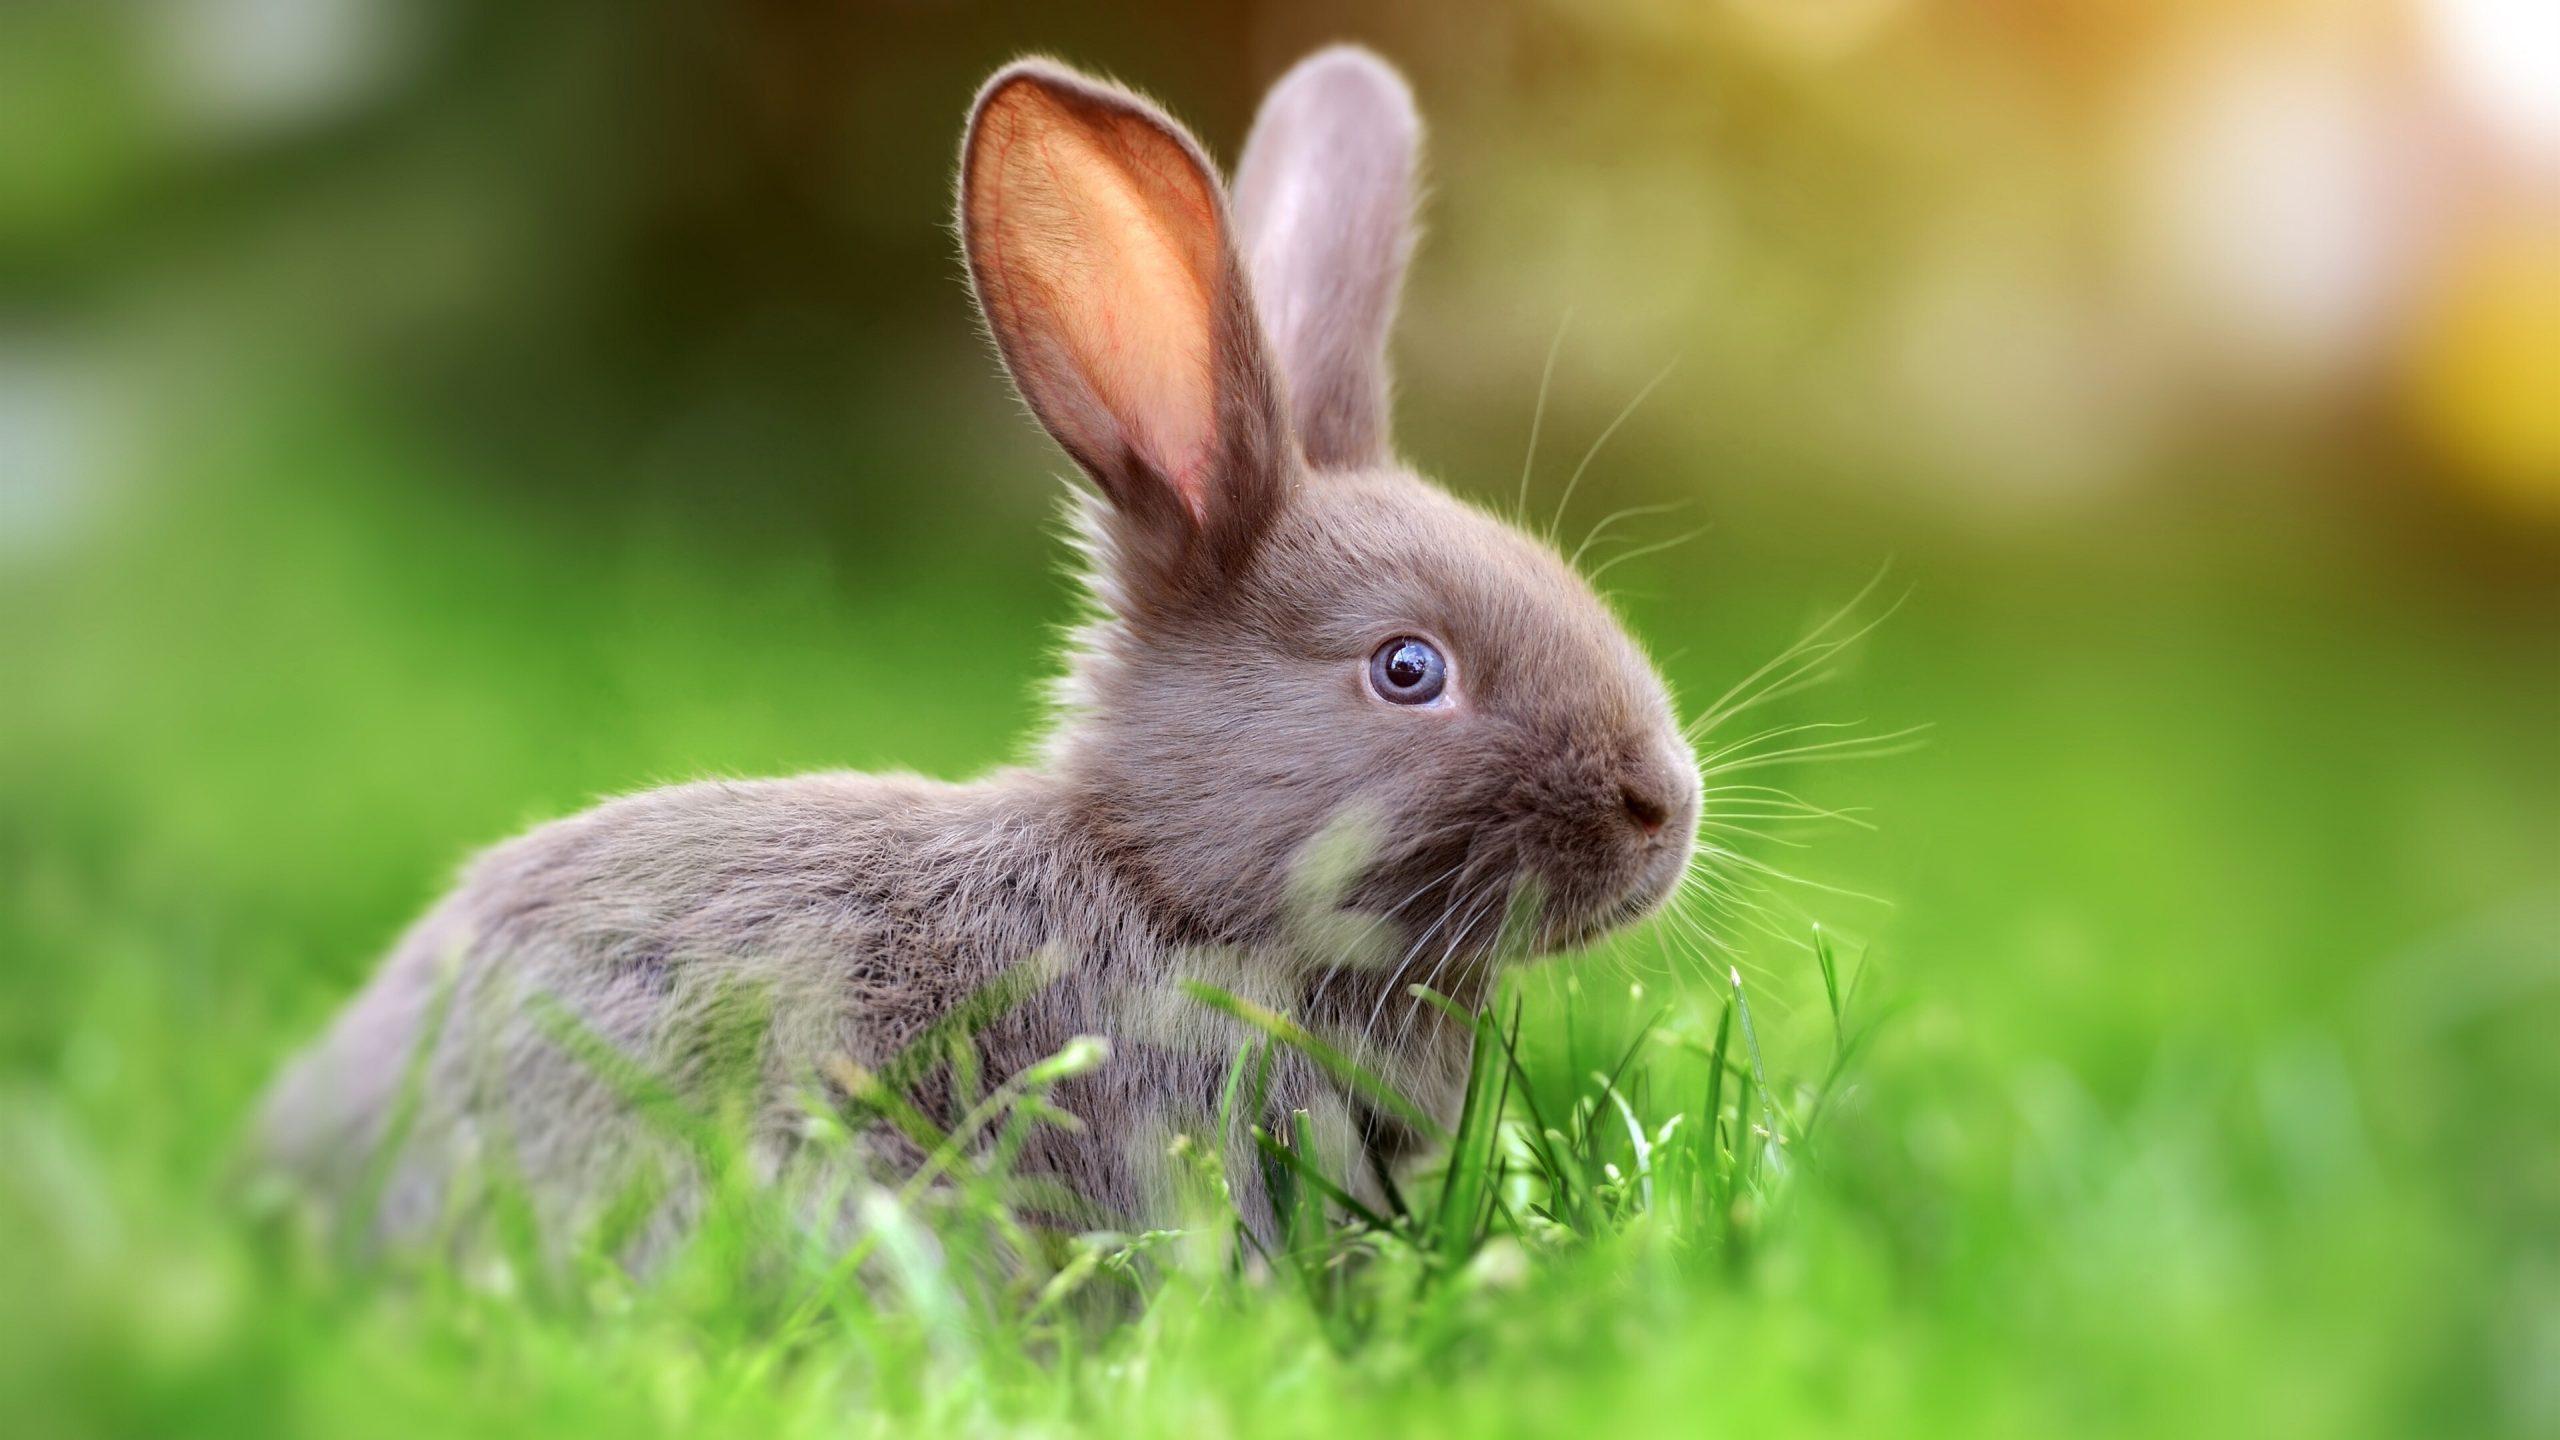 Rabbit 4K Wallpaper scaled